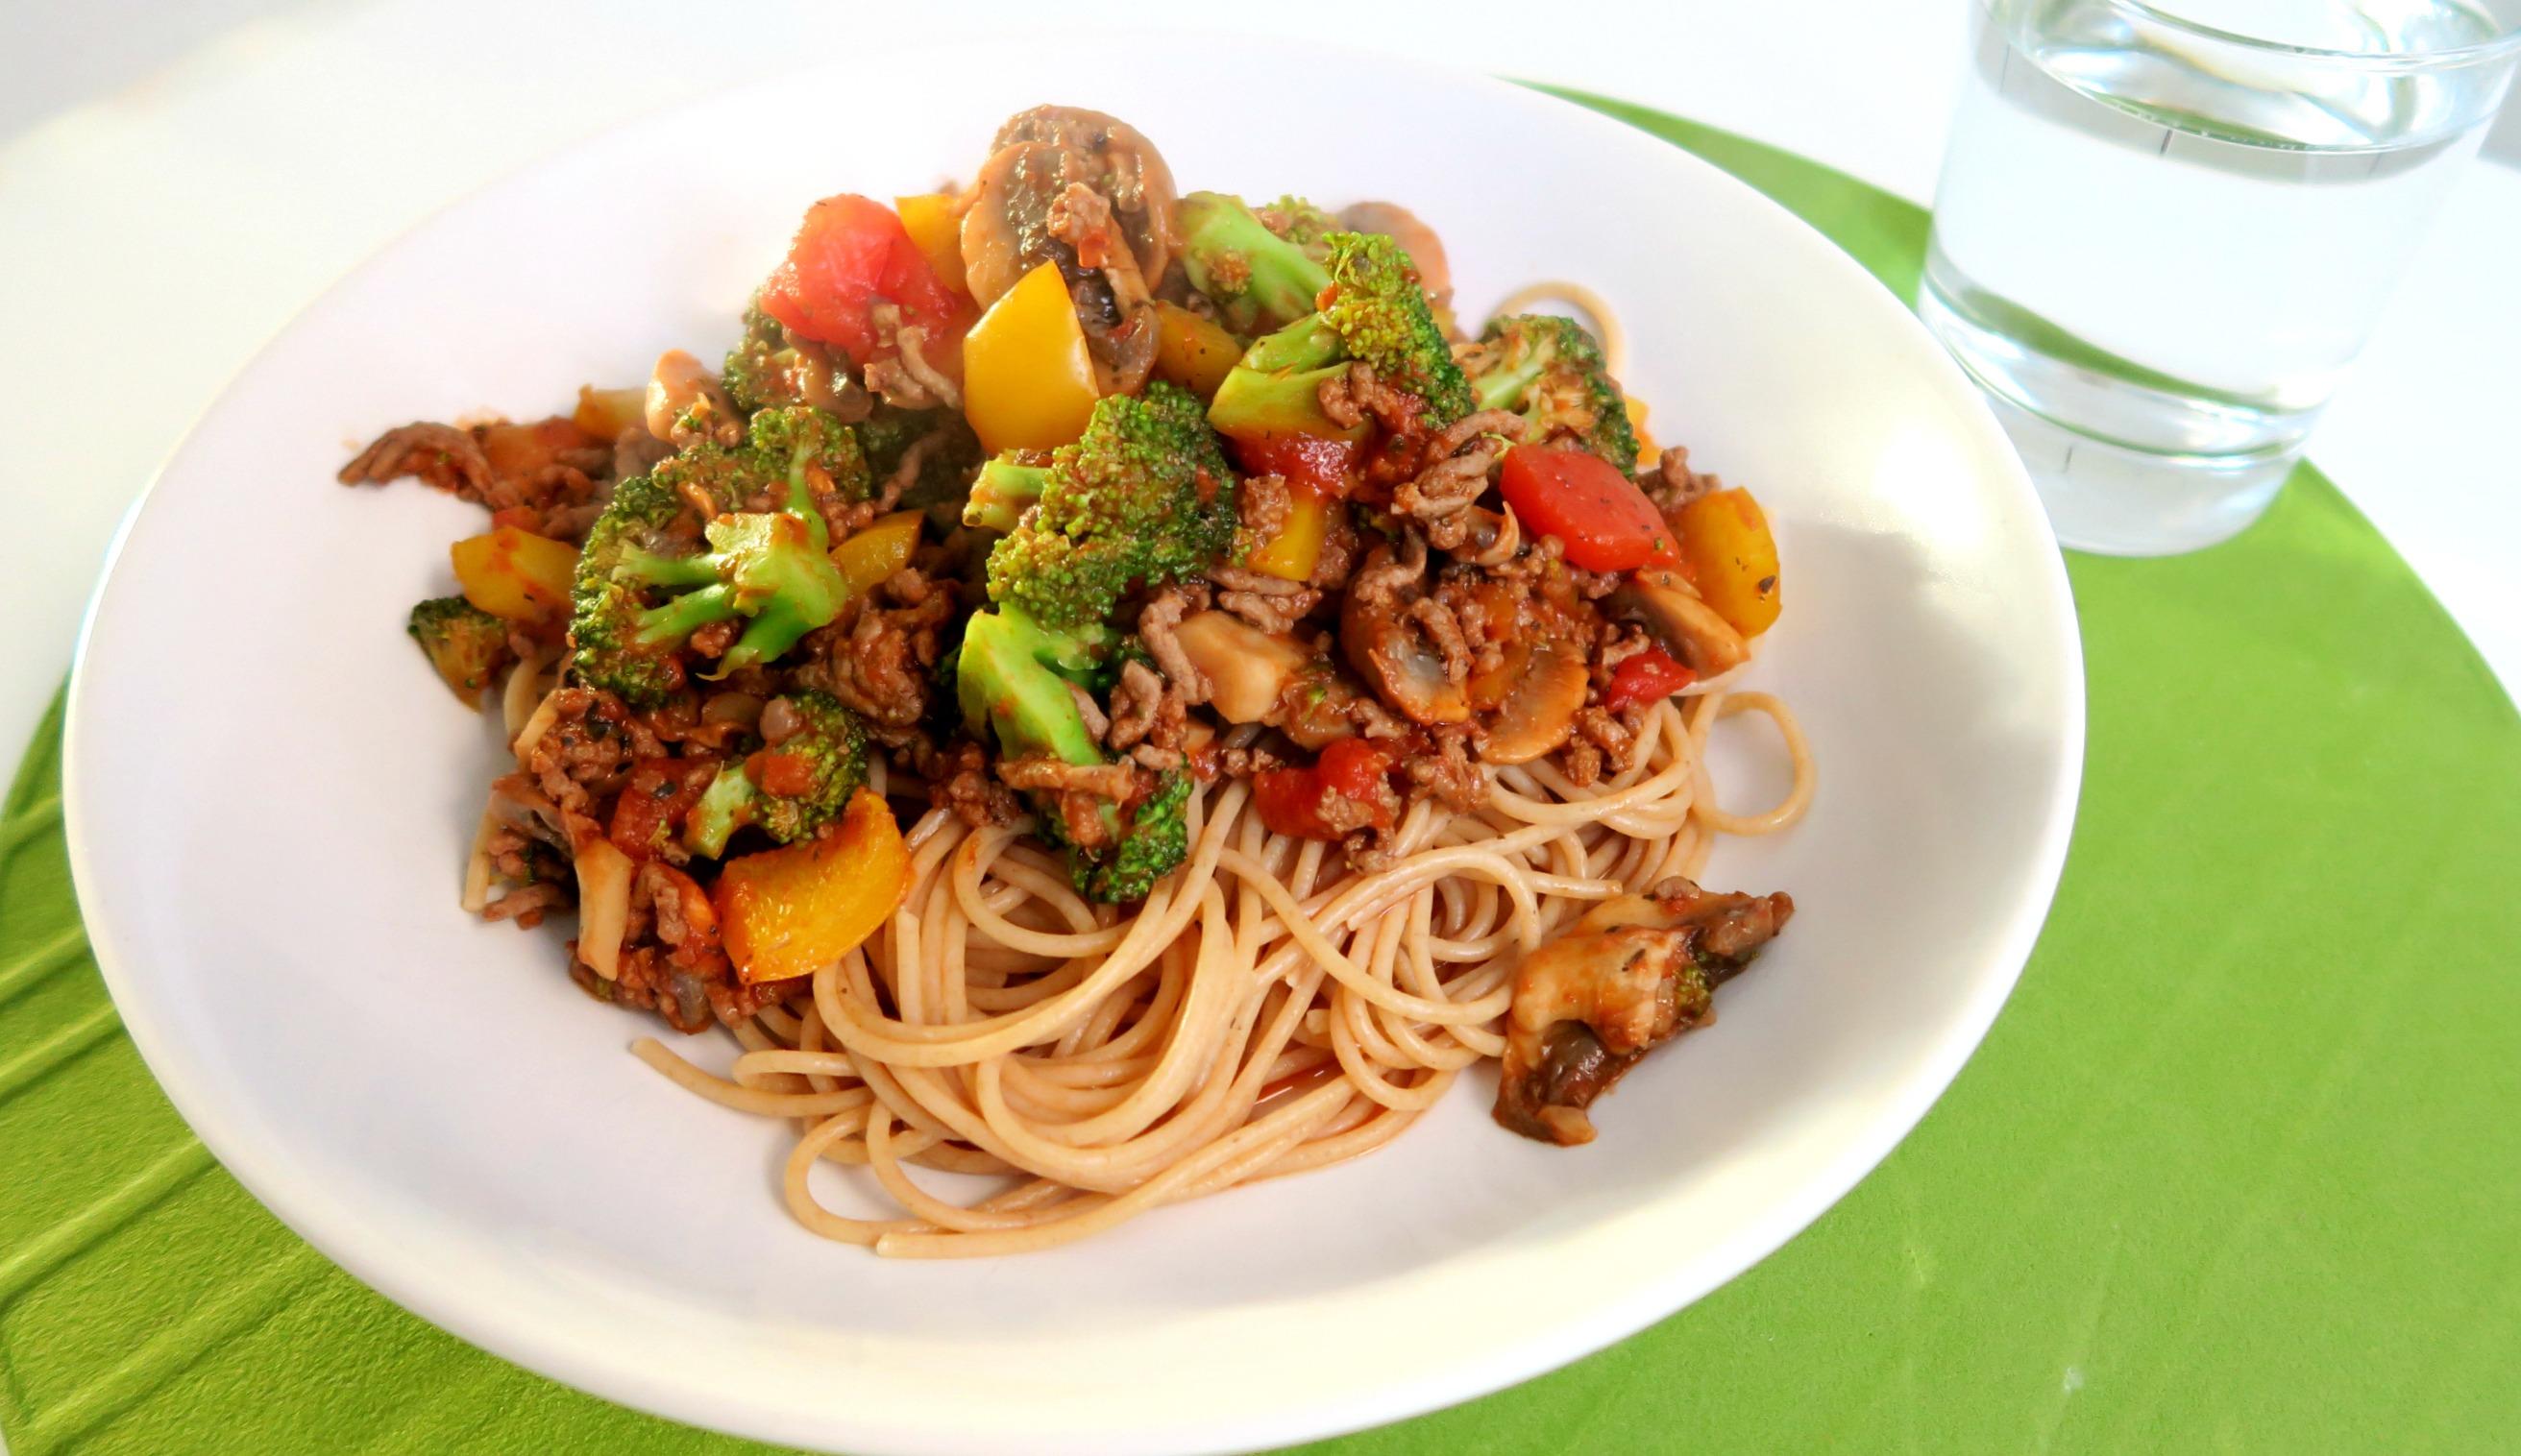 spaghetti met broccoli en gehakt